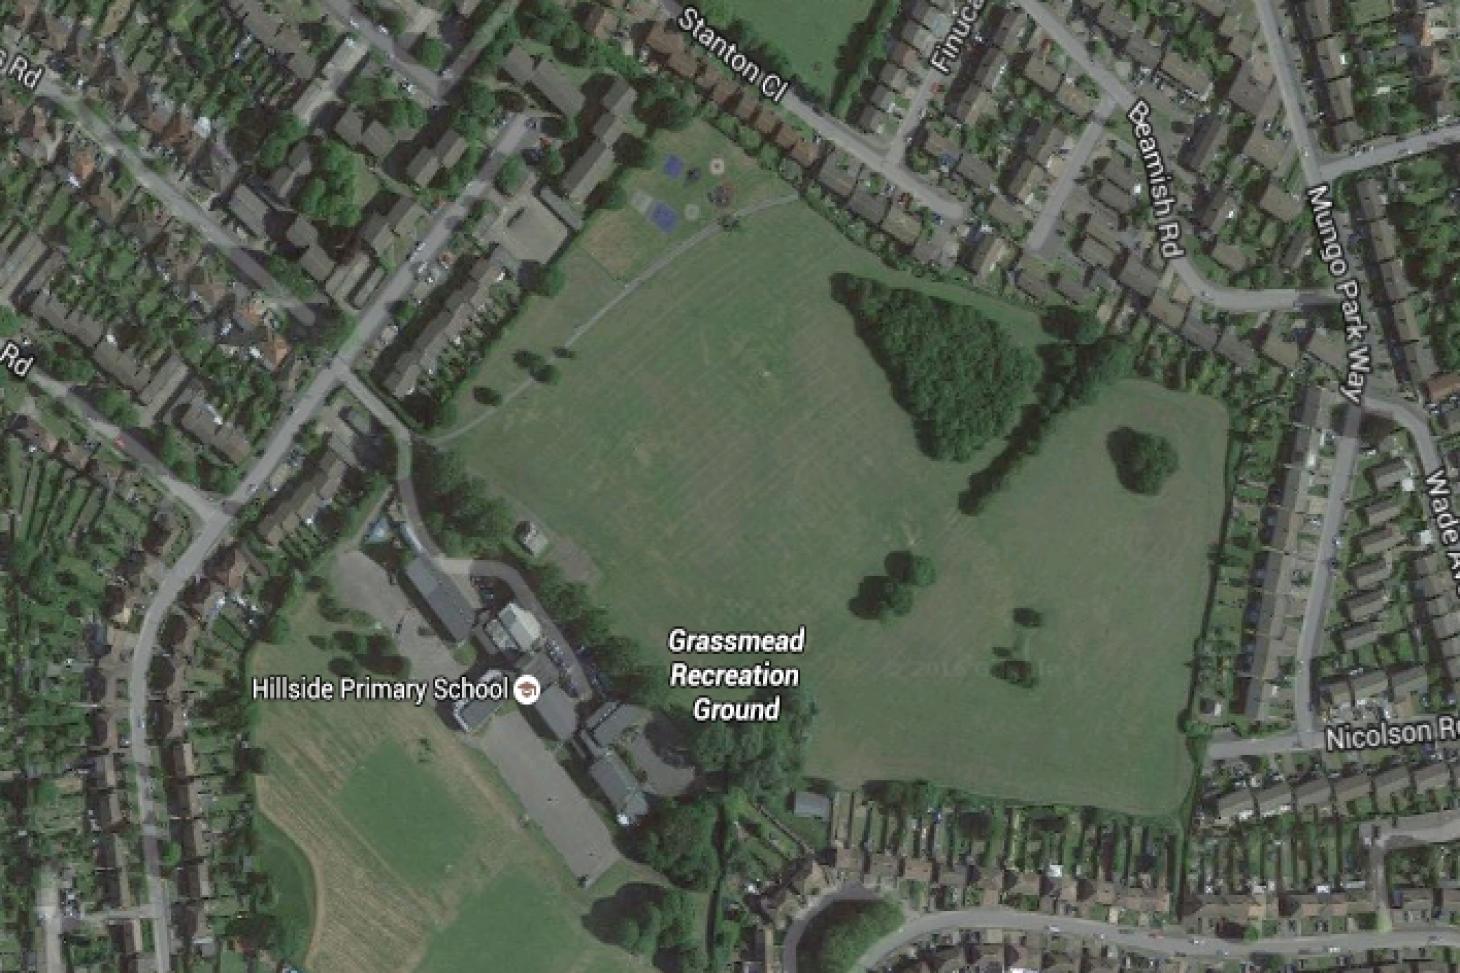 Grassmead Recreation Ground 11 a side | Grass football pitch